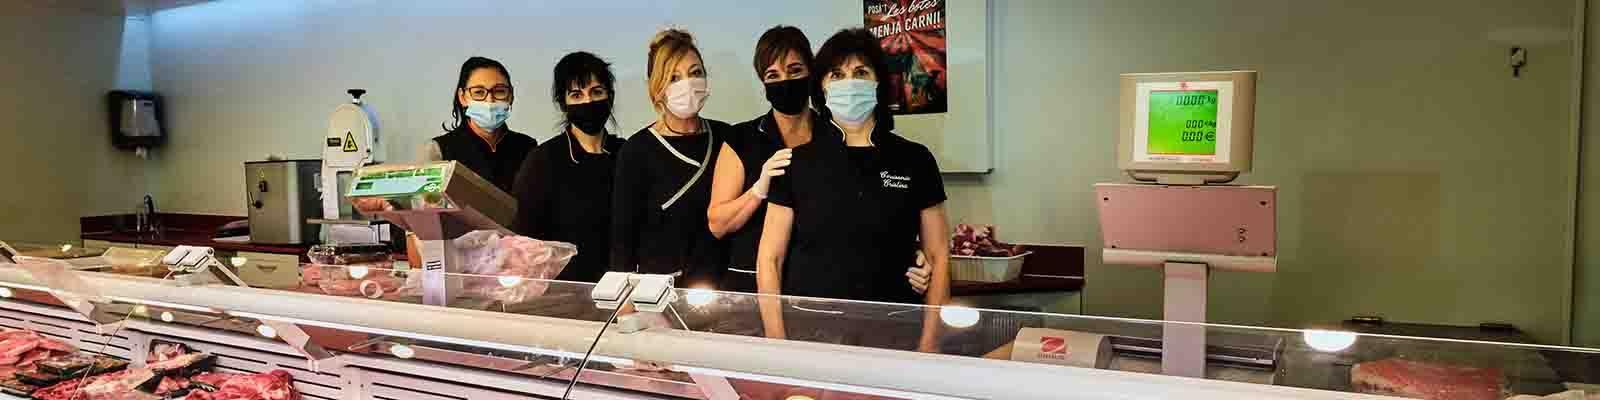 Carnicería Cristina -Ramacisa